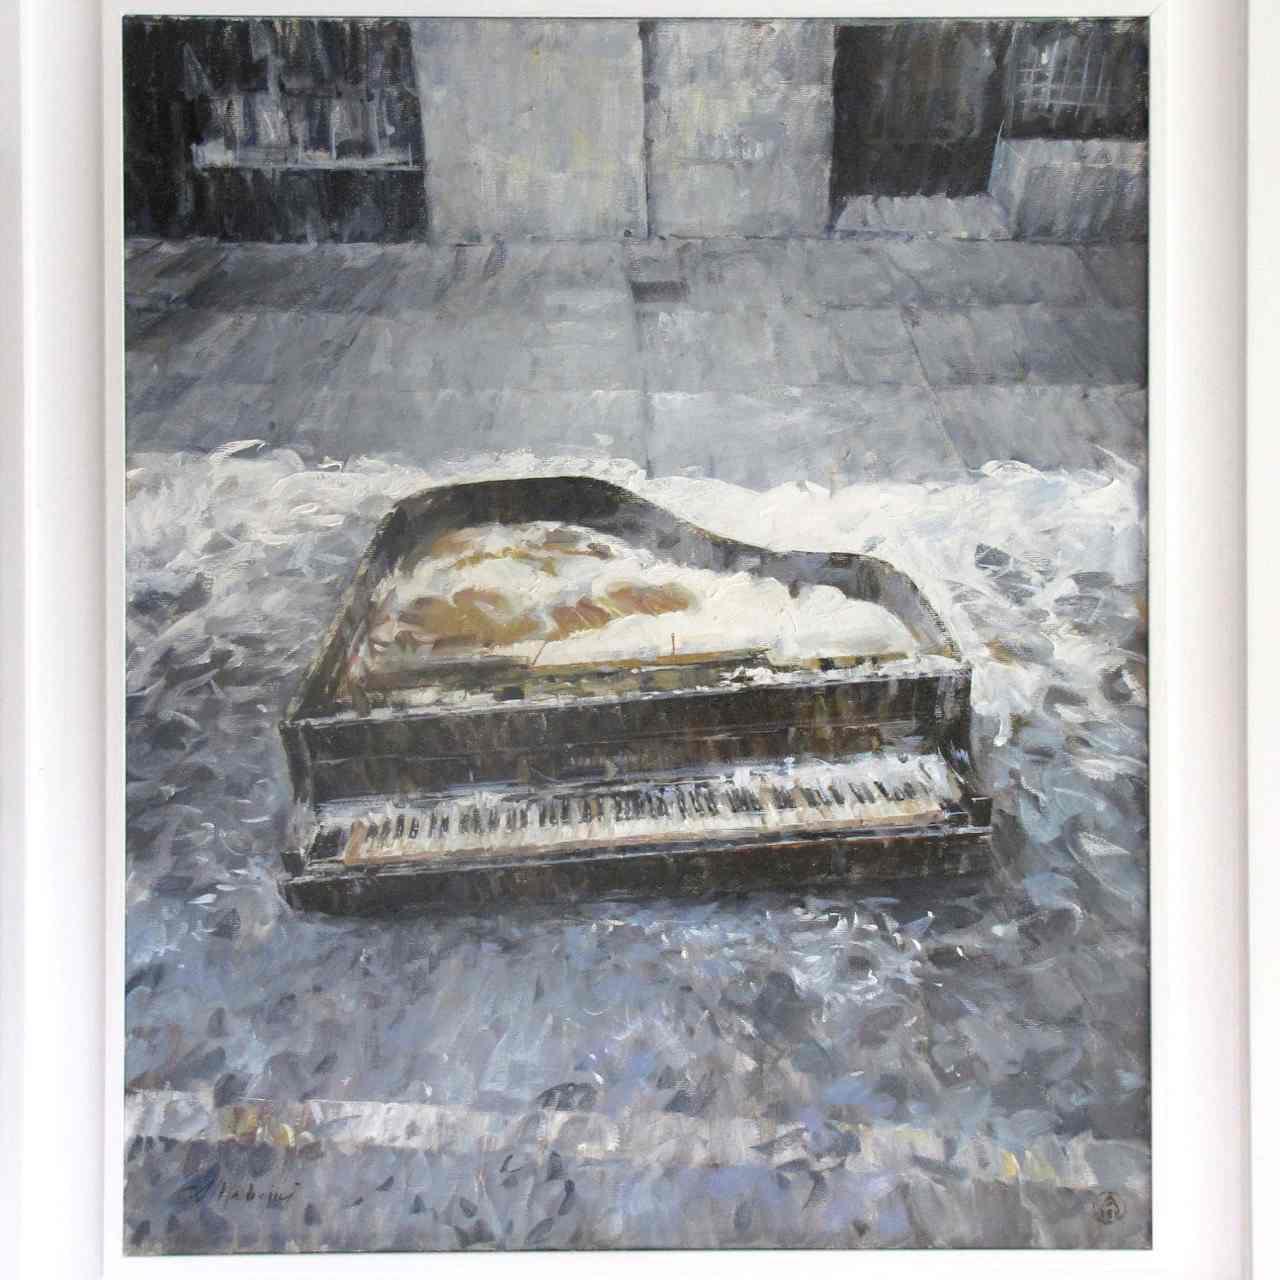 Pianoforte di Ingvar Kamprad, presidente dell'Ikea - 2011, olio, cm 60x50 - nr.960